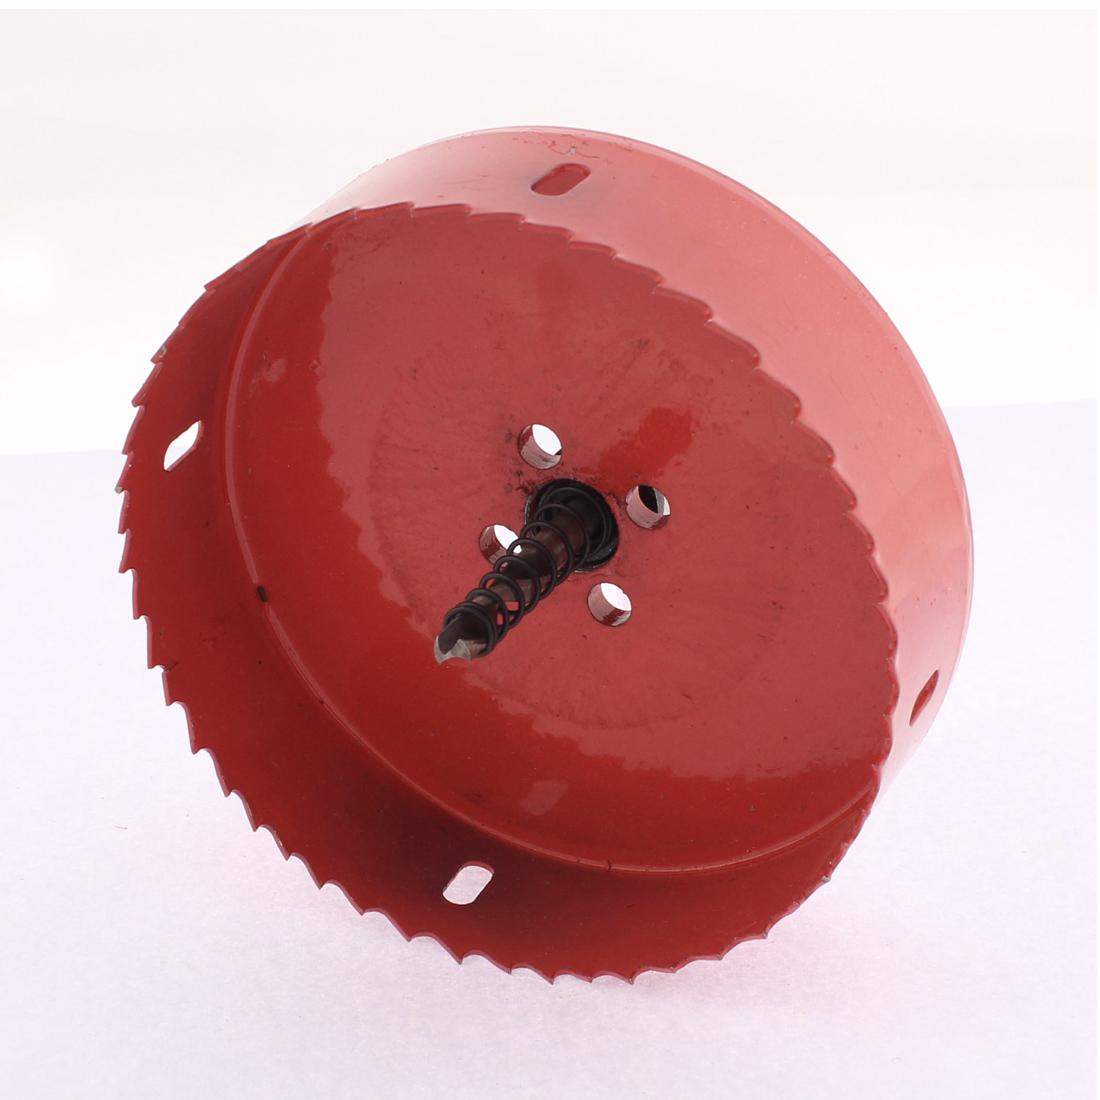 Aluminum Iron Wood 120mm HSS Bi-Metal Hole Saw Cutter Drill Bit Red